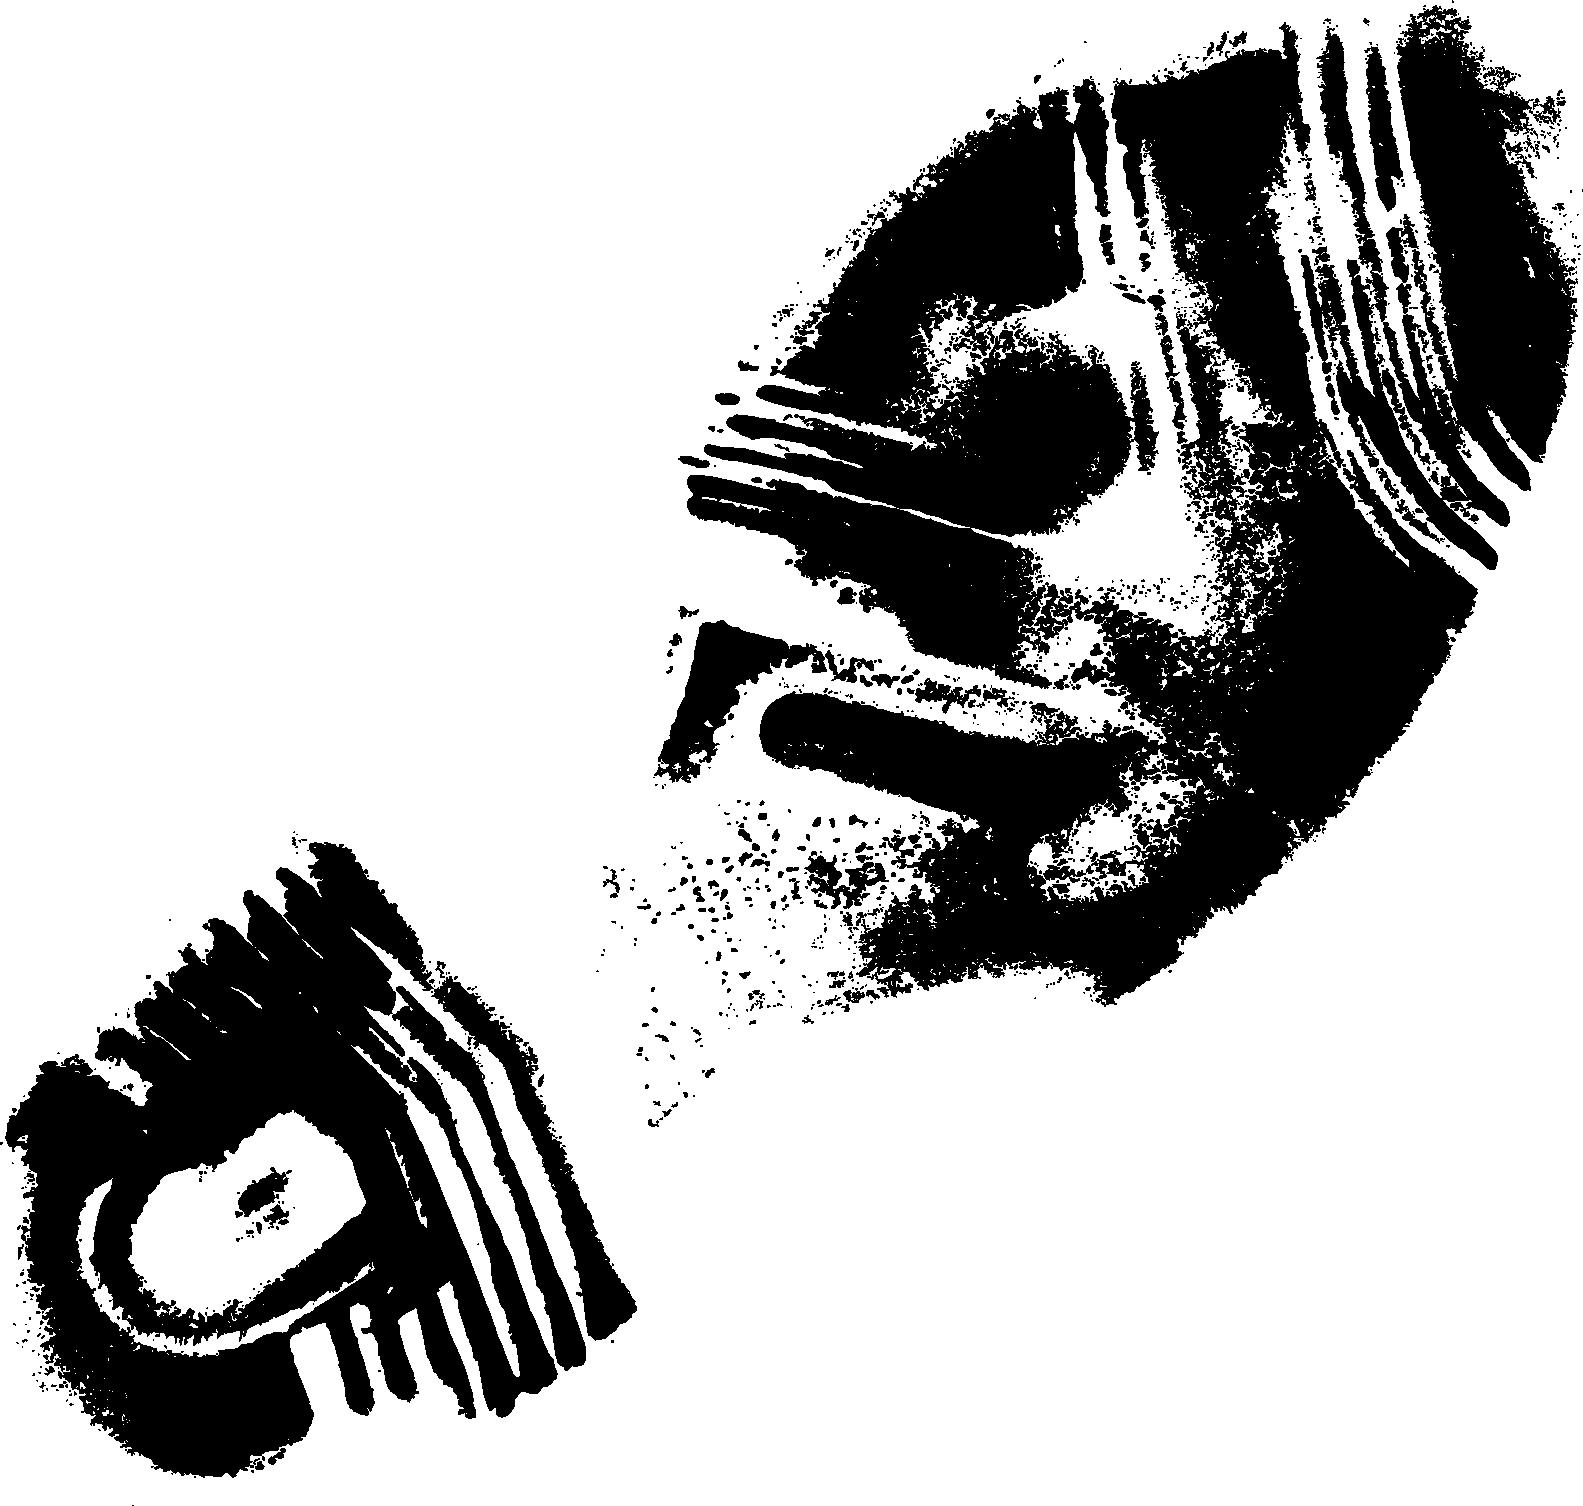 PNG Footprint - 154335